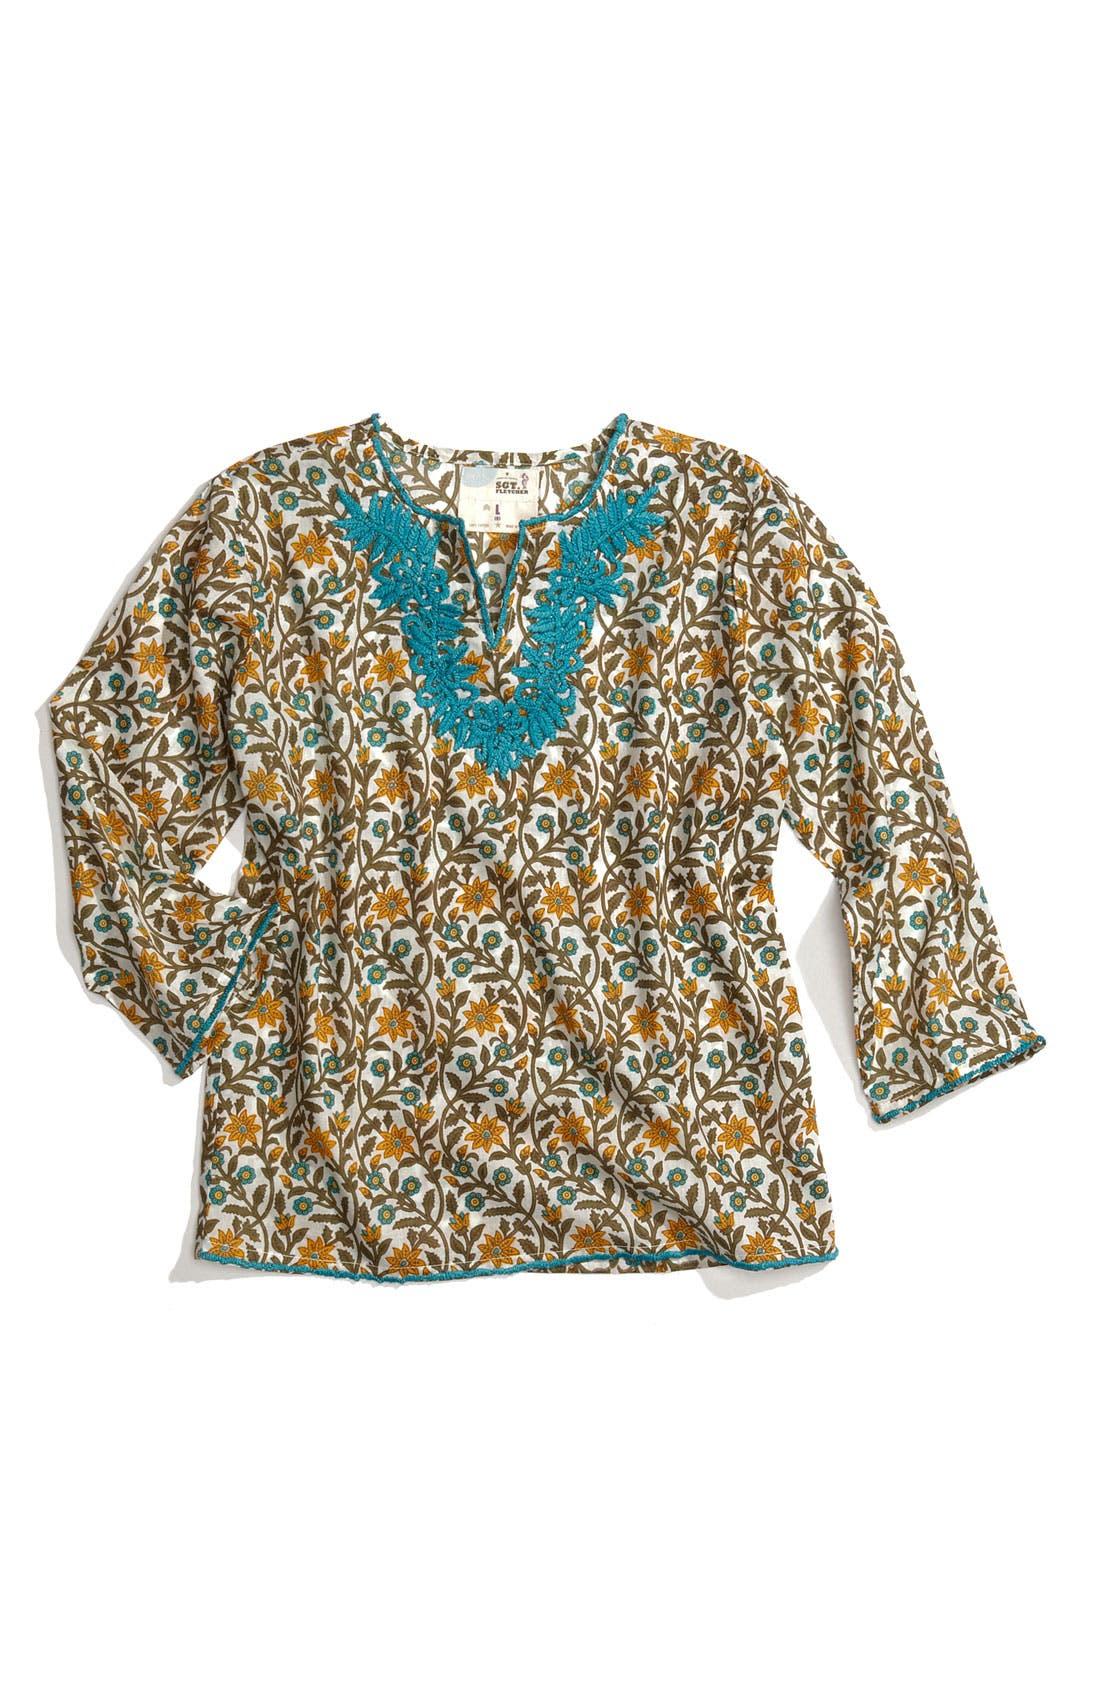 Main Image - Peek 'Embroidered Khurti' Top (Big Girls)